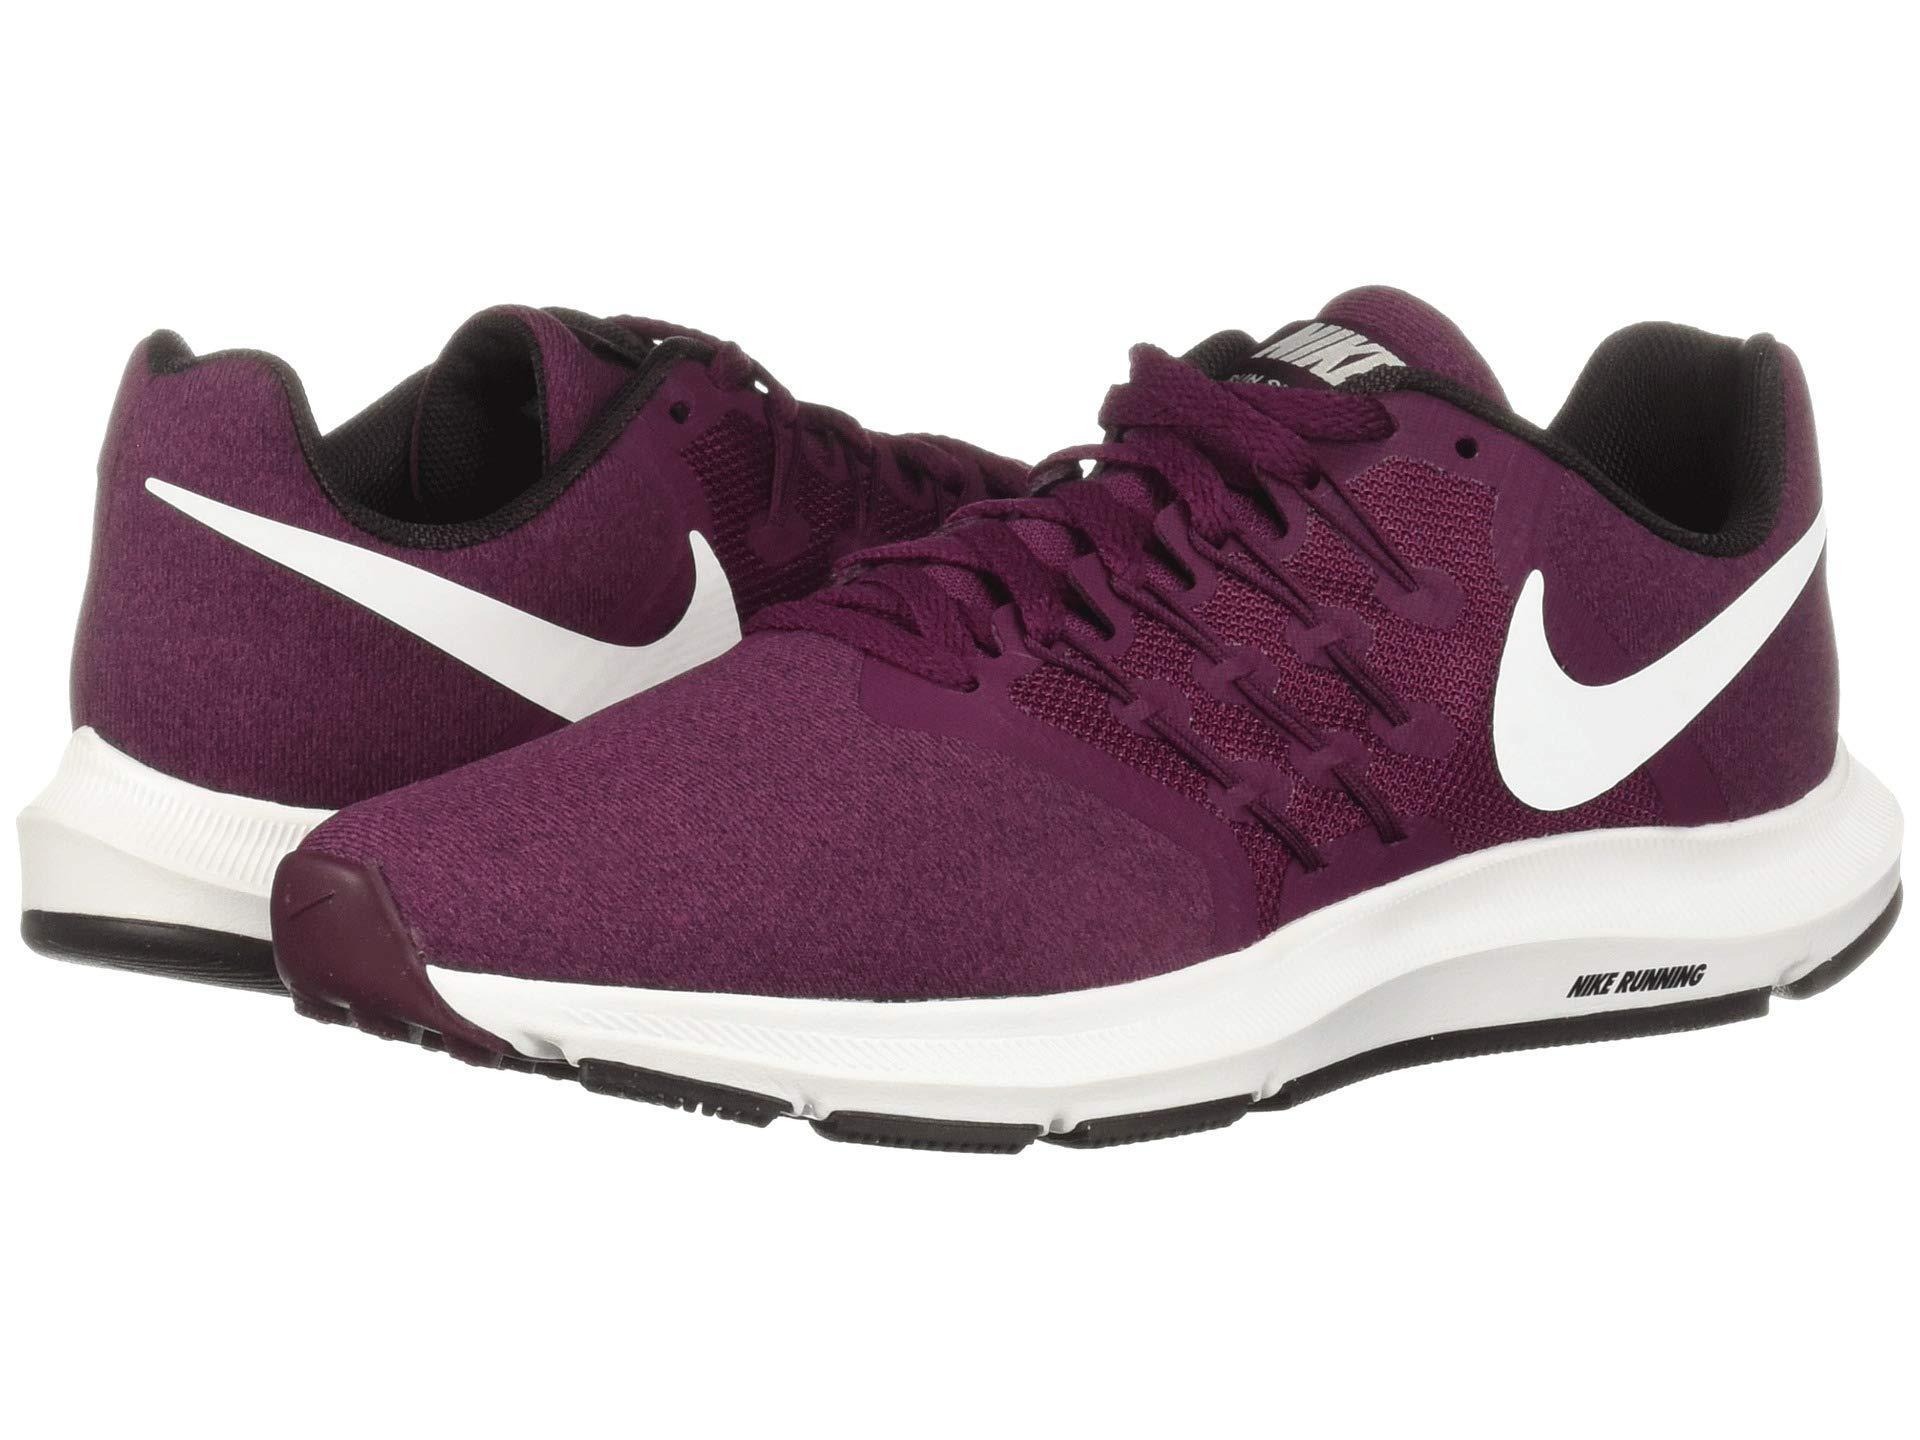 adb7f54a2a0 Nike Purple Run Swift (bordeaux/summit White/burgundy Ash) Women's Running  Shoes